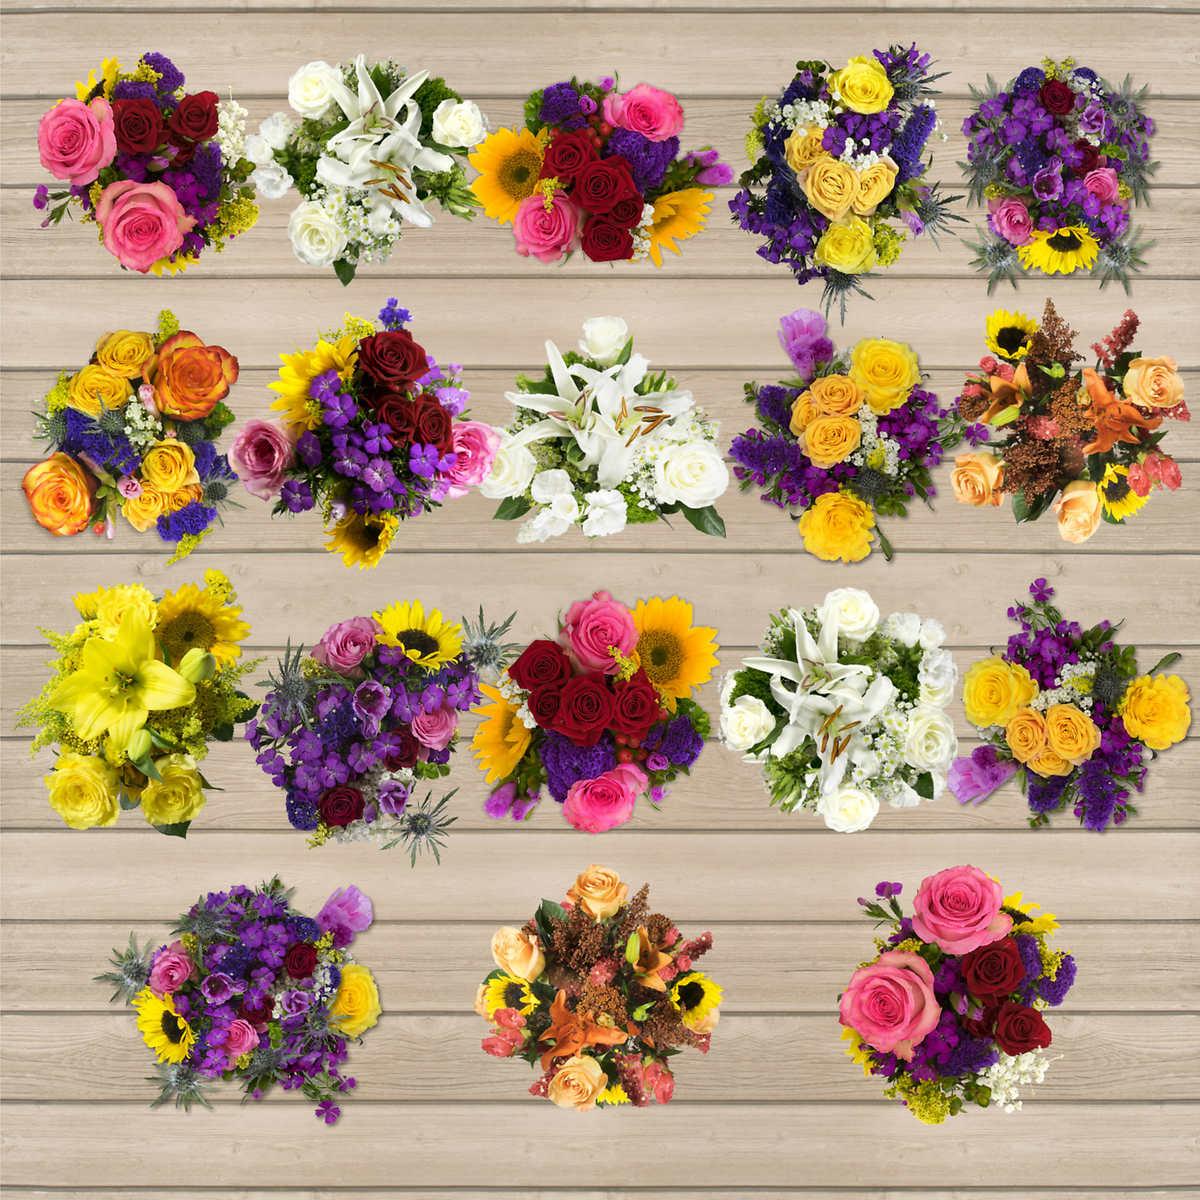 Wedding event flowers costco 18 european mini bouquets growers choice dhlflorist Choice Image